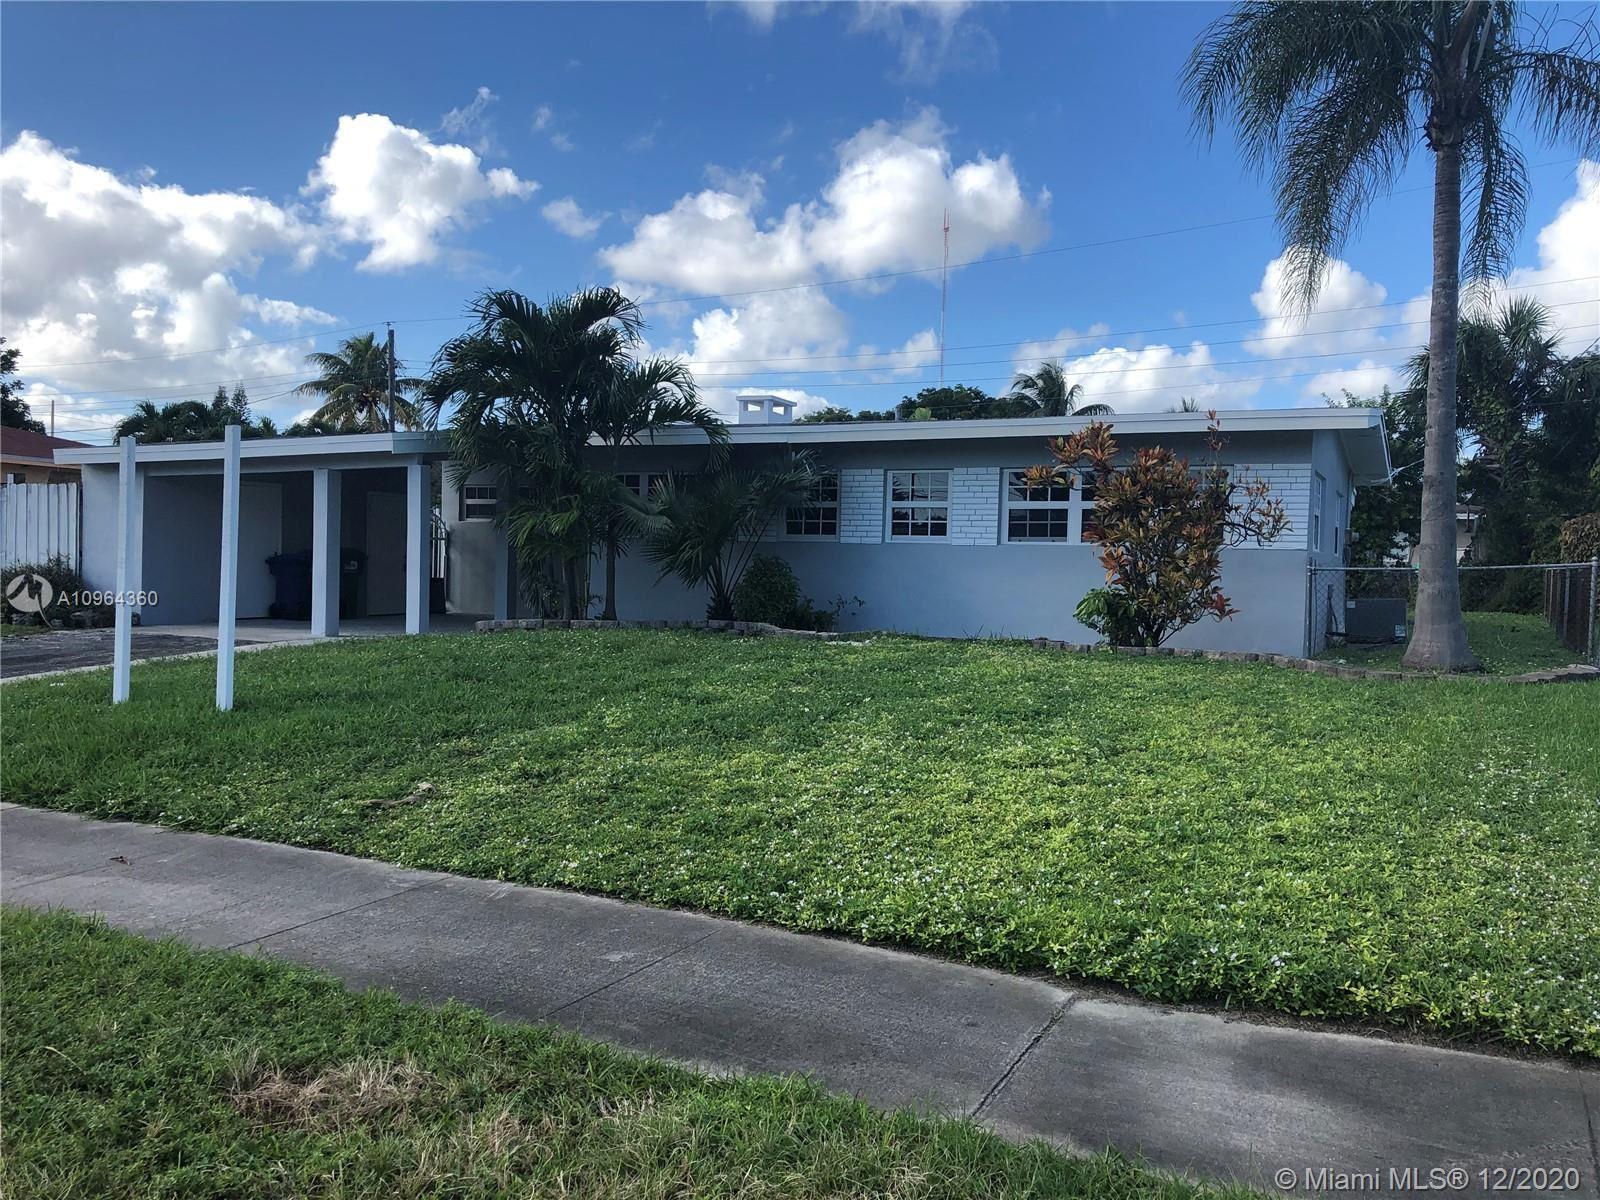 101 NW 193rd St, Miami Gardens, FL 33169 - #: A10964360